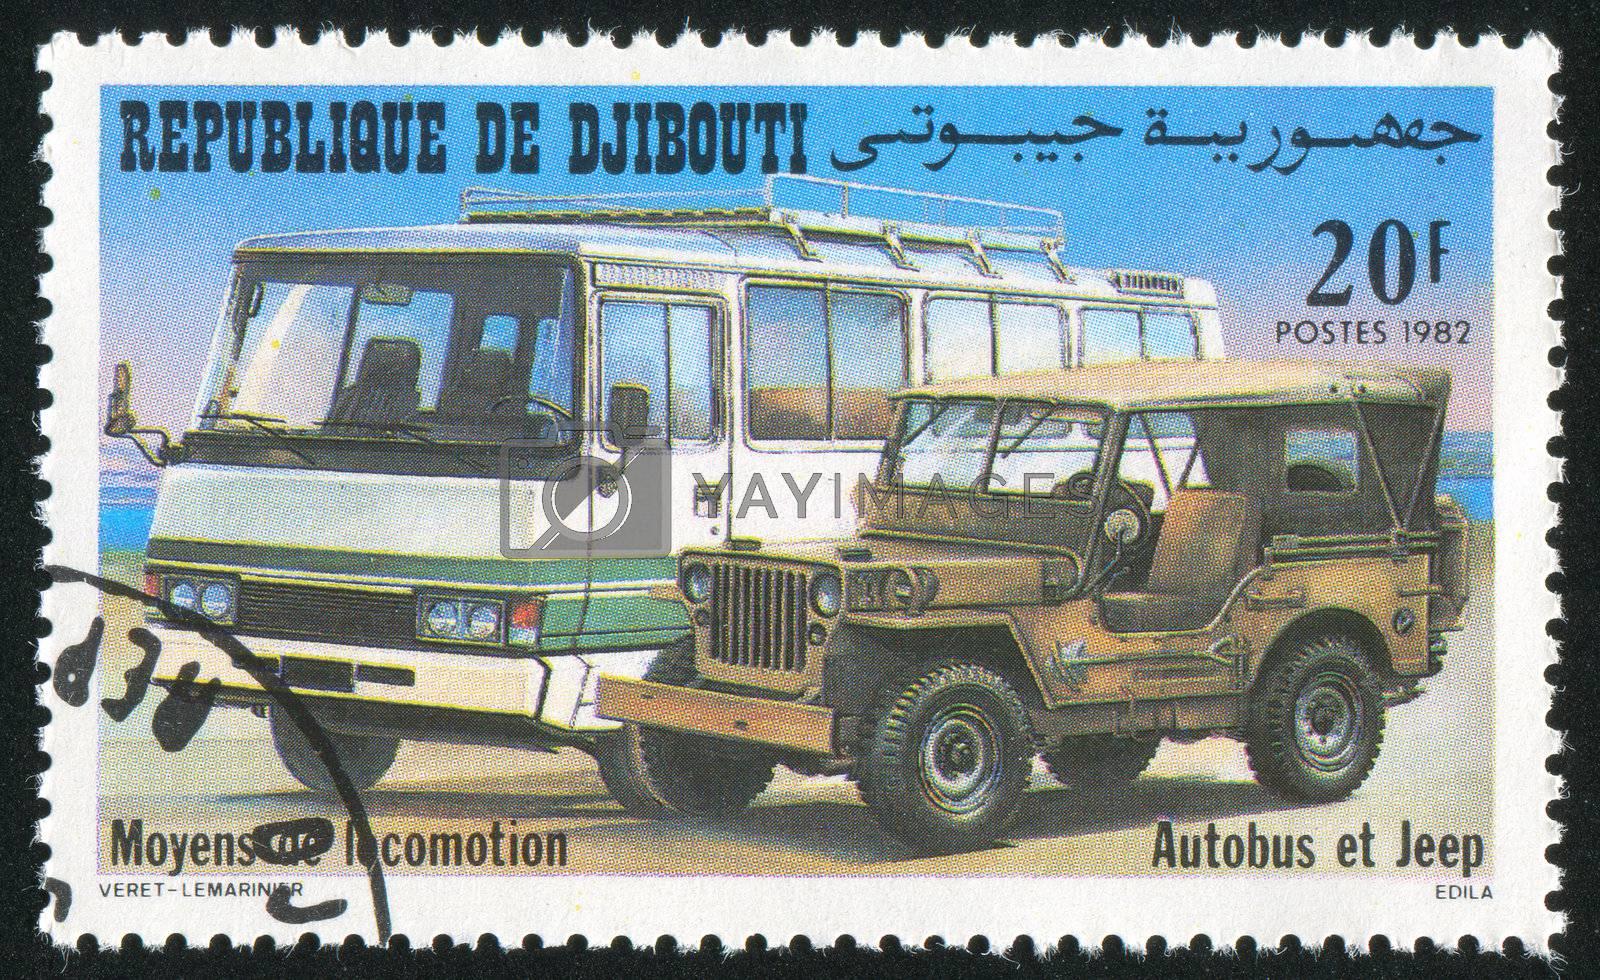 DJIBOUTI - CIRCA 1982: stamp printed by Djibouti, shows Bus and Jeep, circa 1982